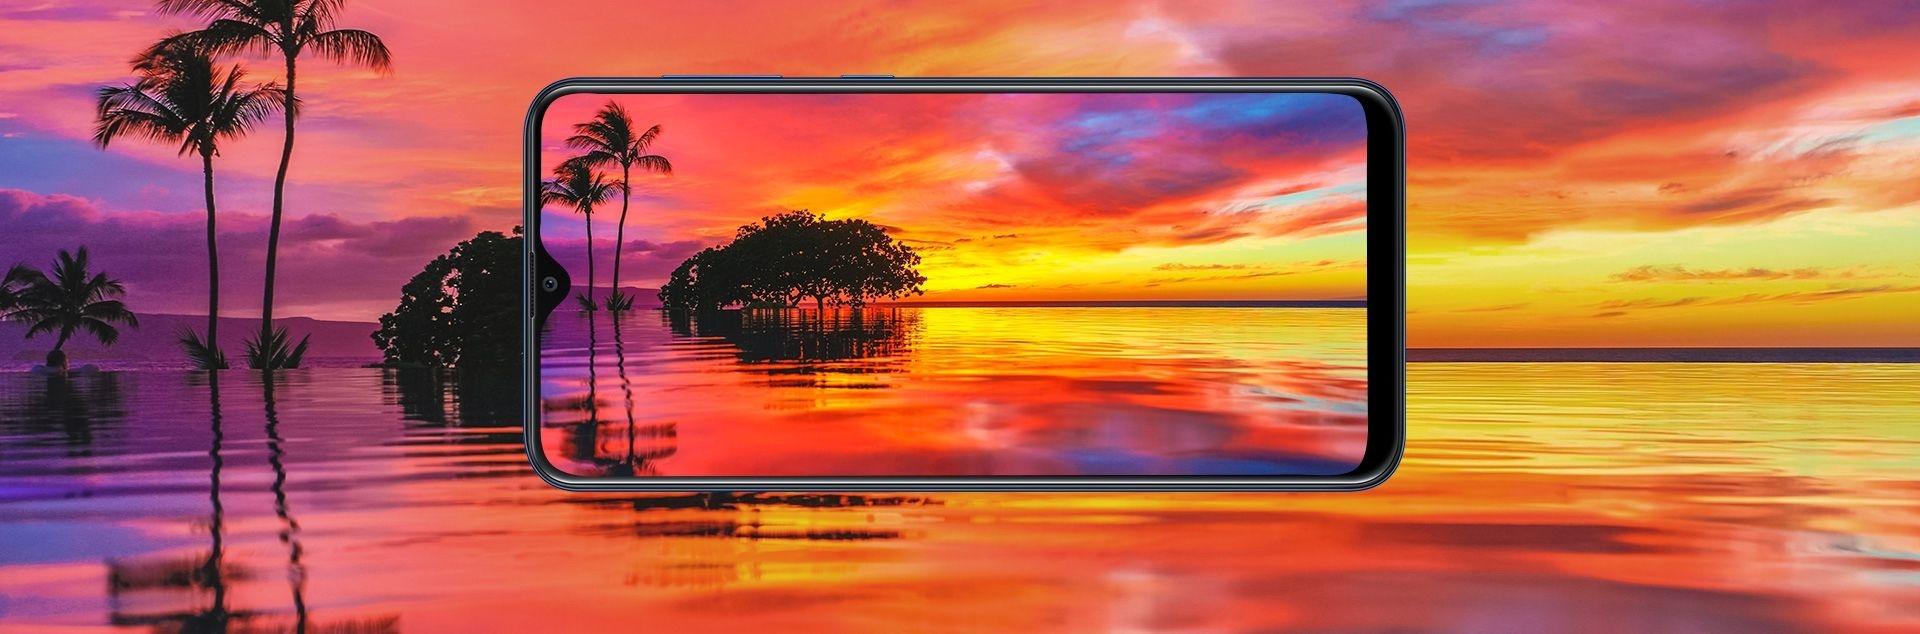 Samsung Galaxy A20 sAMOLED 6.4 inch Infinity-V Display